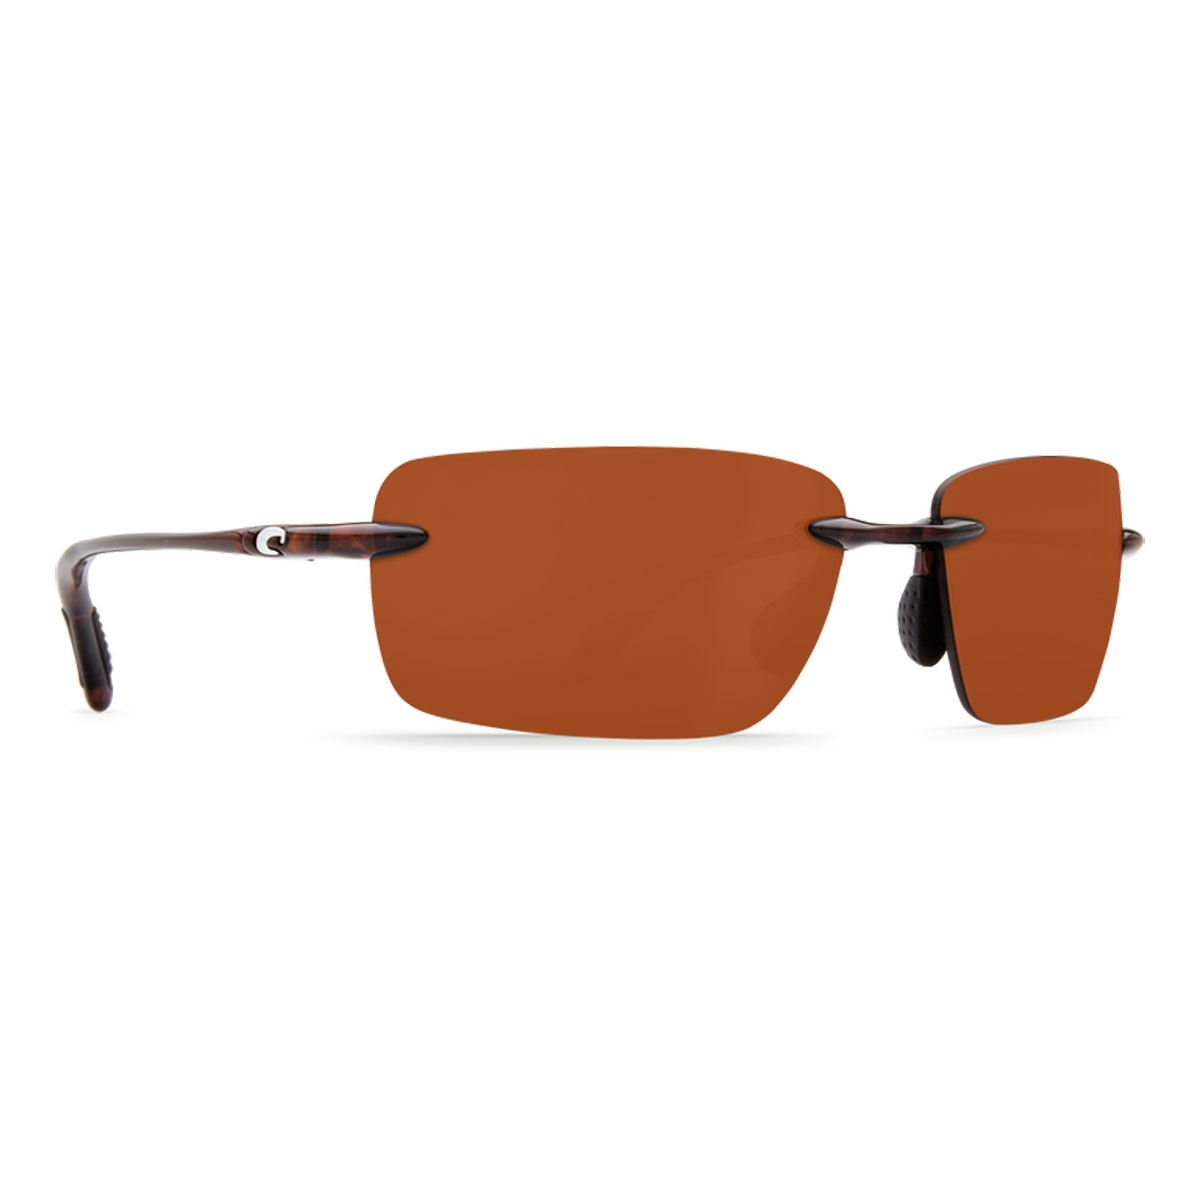 be04f1cecbb Image of Costa Del Mar Oyster Bay Sunglasses - Tortoise Frame   Copper P  Lens